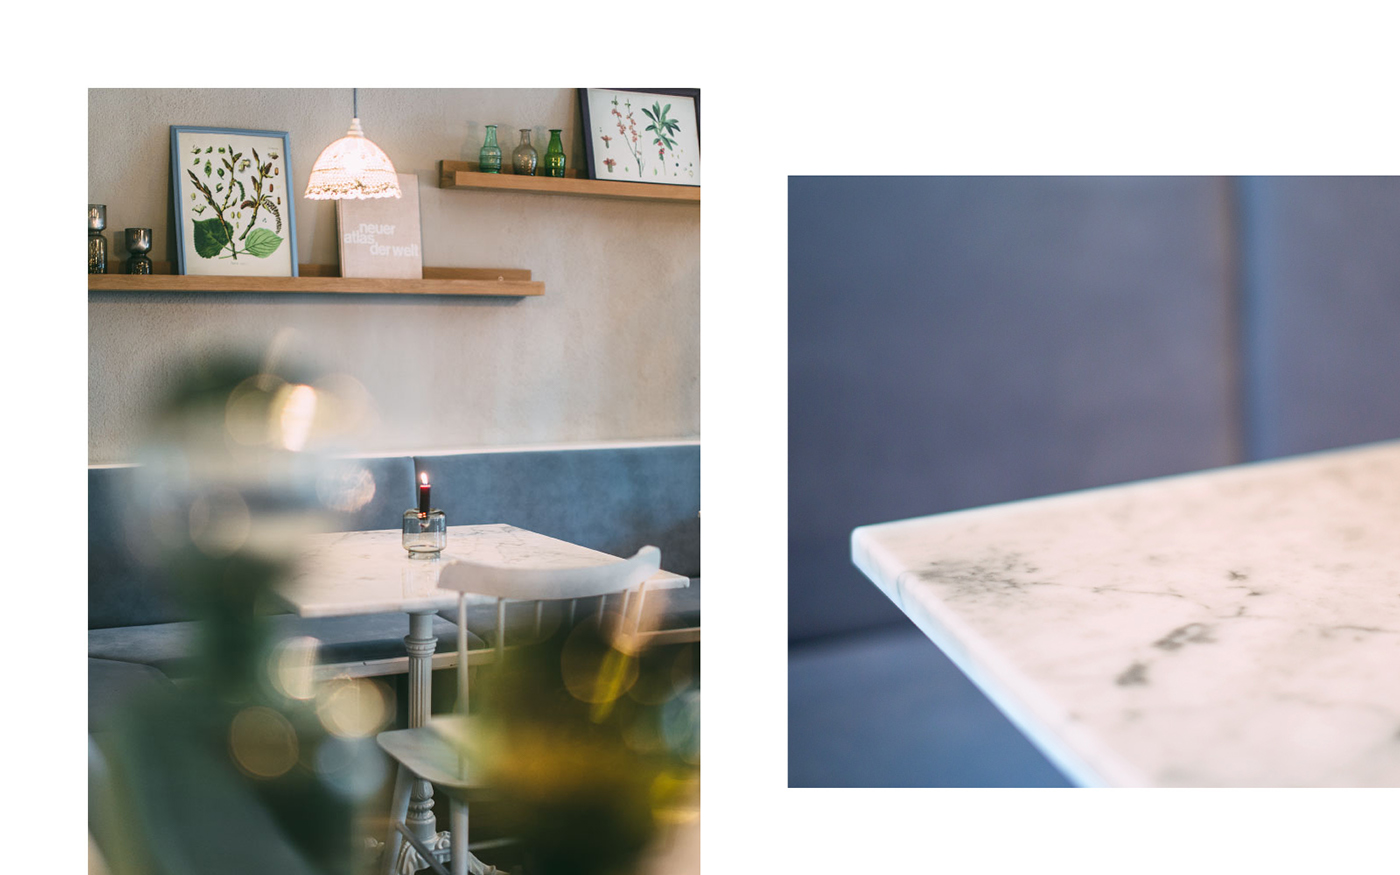 Gruener Michel-branding-interior design-hisheji (5)